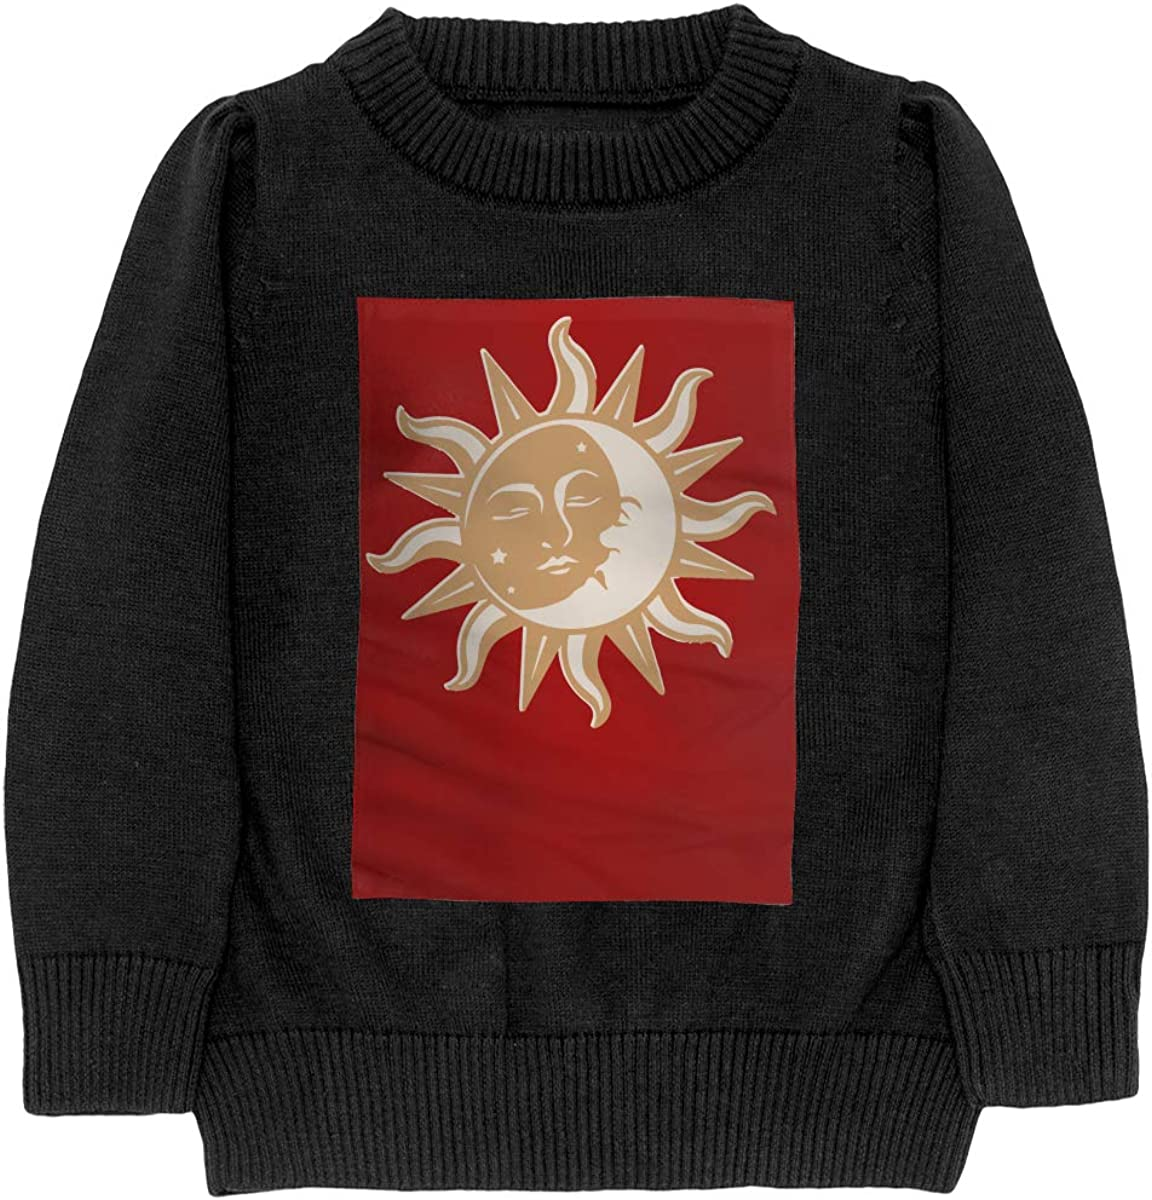 Sun Moon Brown Cool Teenager Boys Girls Unisex Sweater Keep Warm